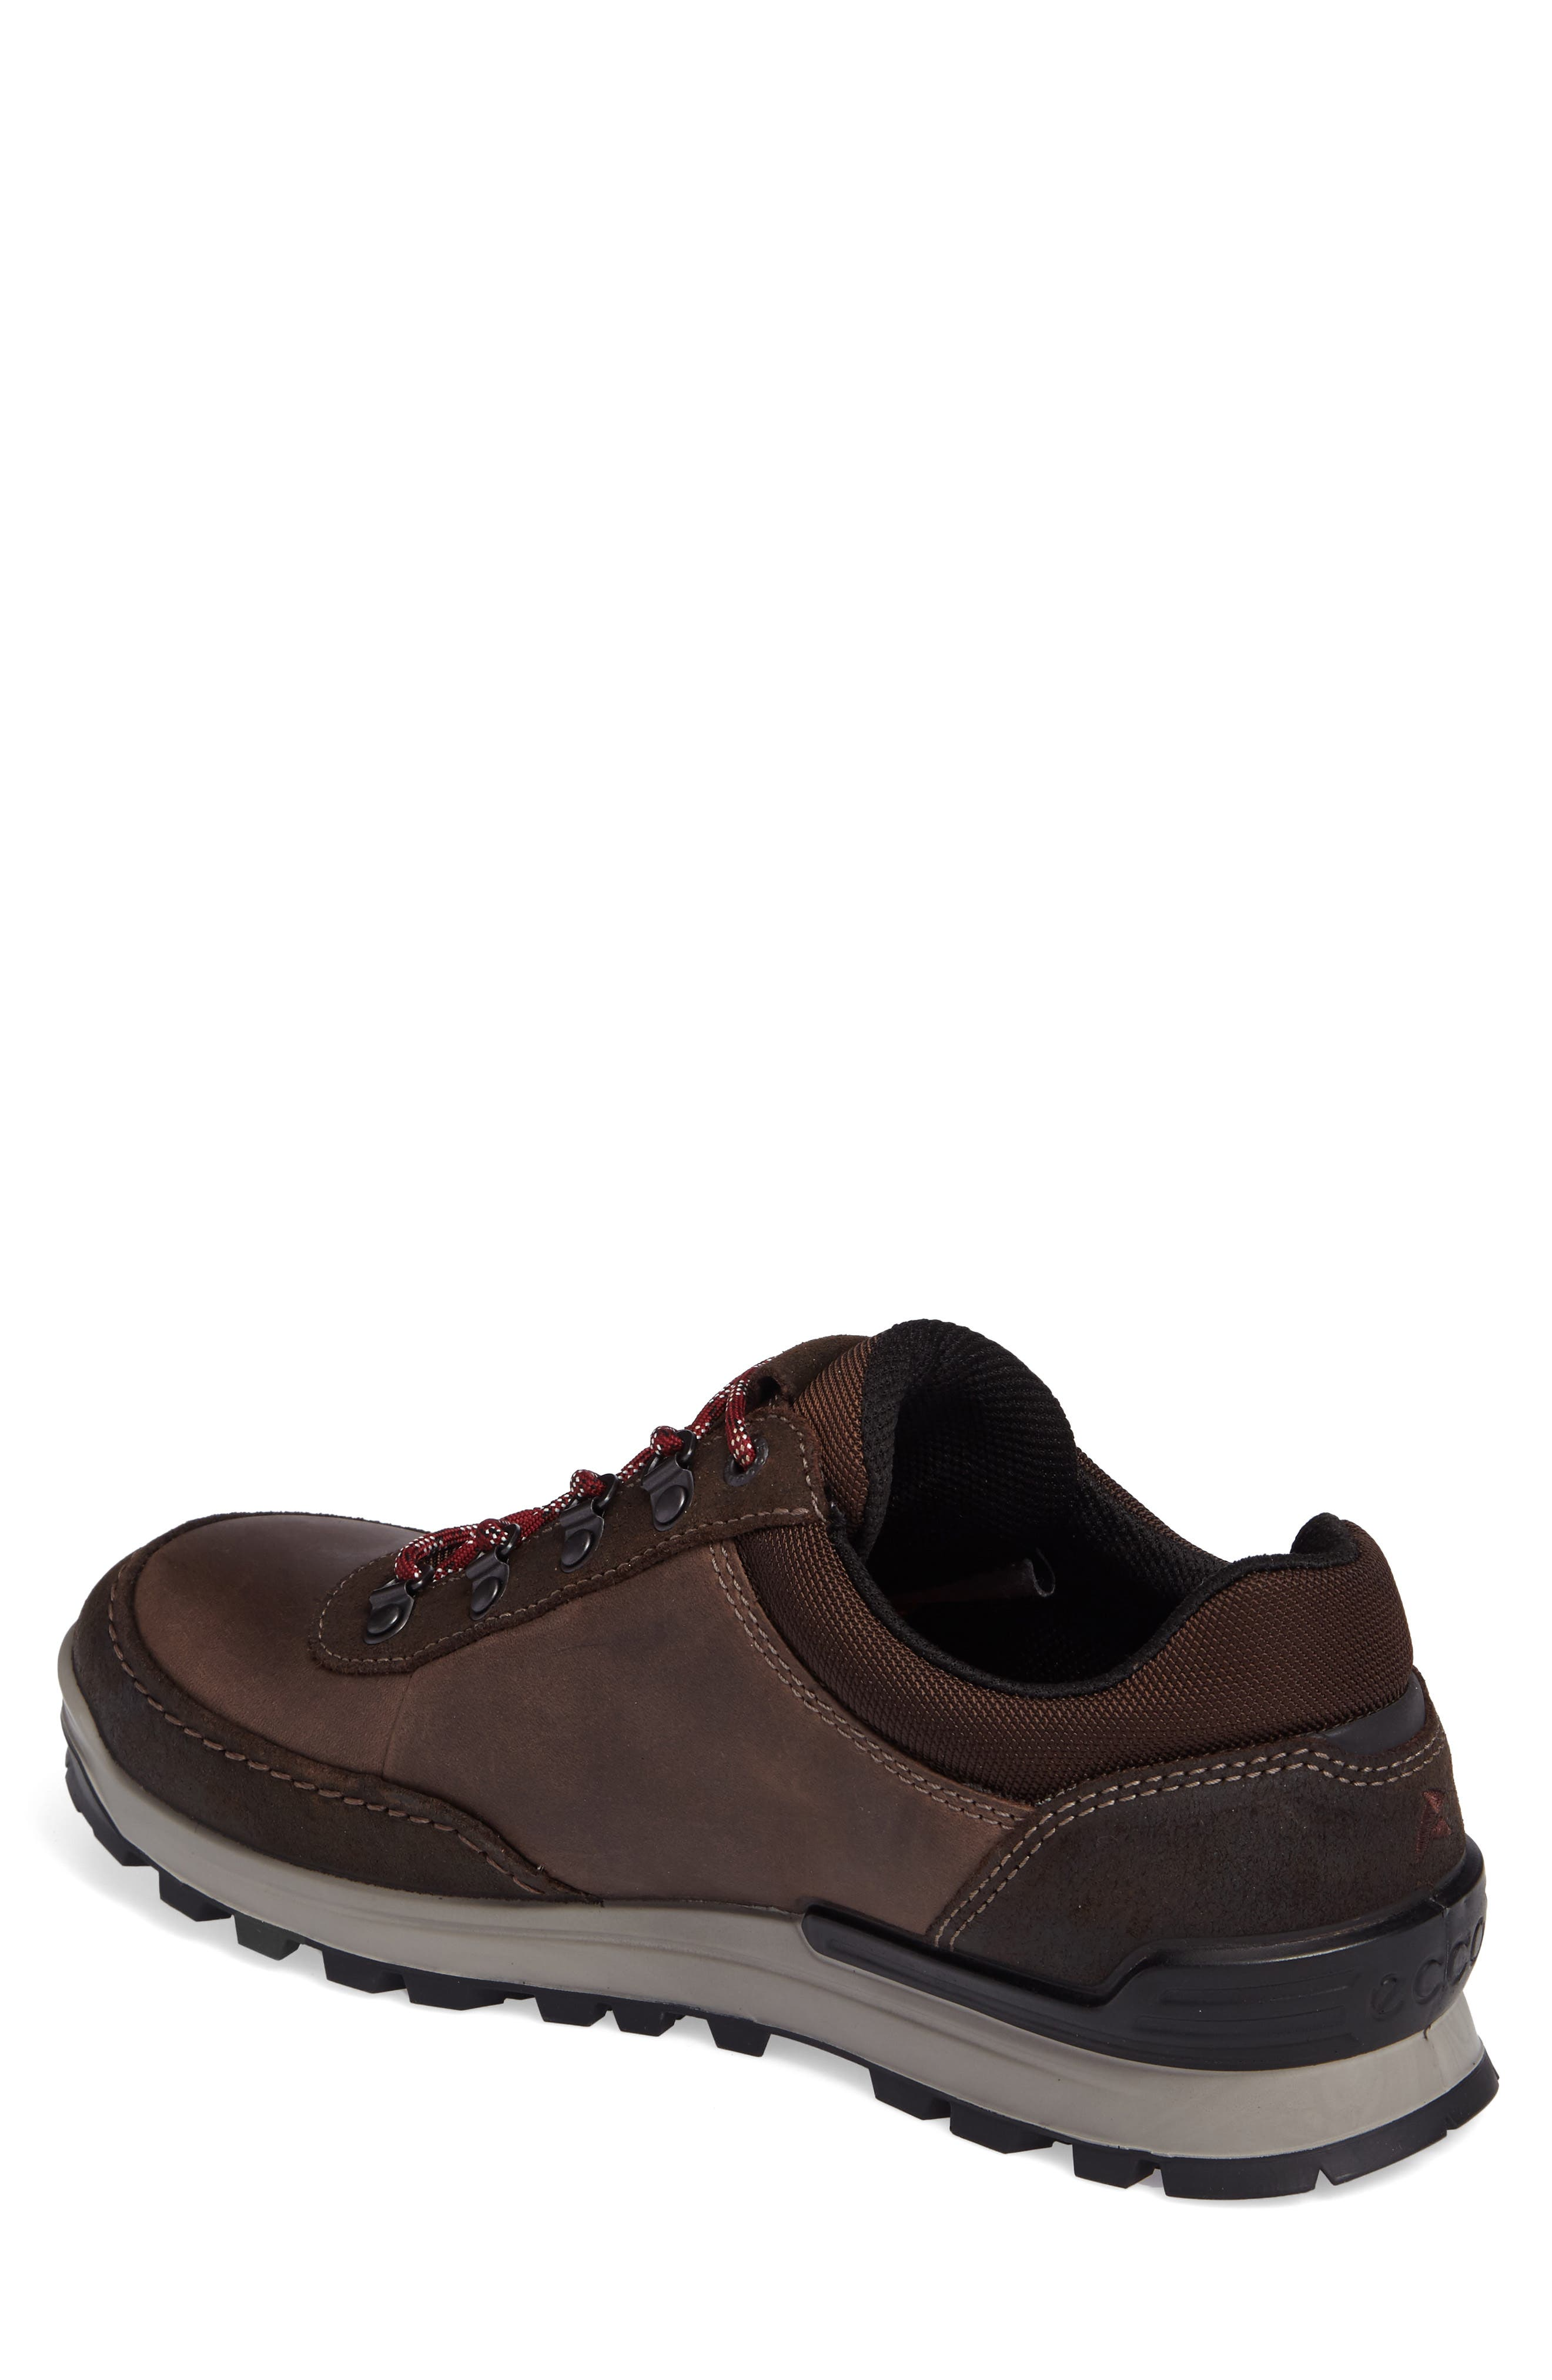 Oregon Sneaker,                             Alternate thumbnail 2, color,                             COFFEE NUBUCK